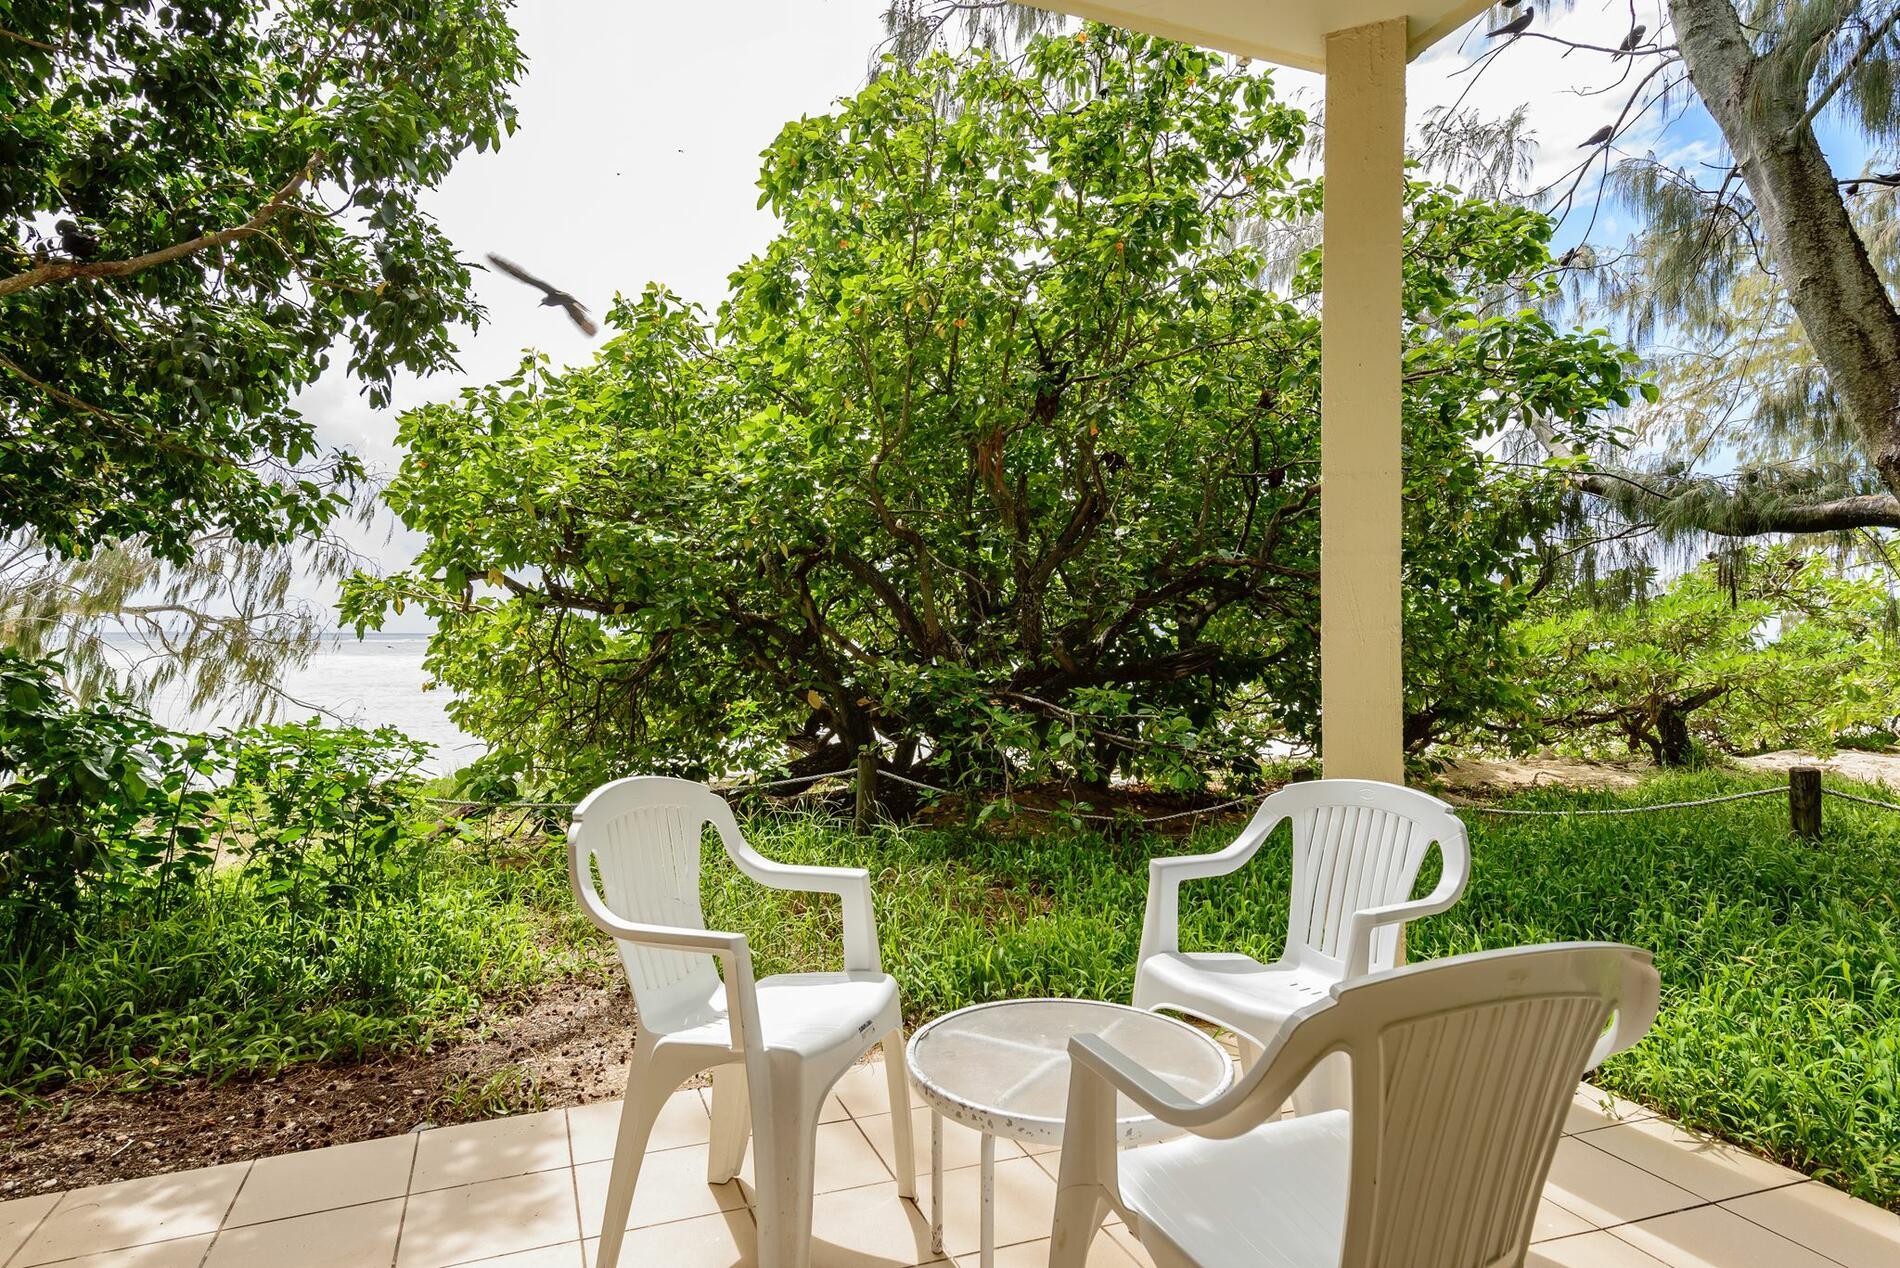 Beachside Suite at Heron Island Resort